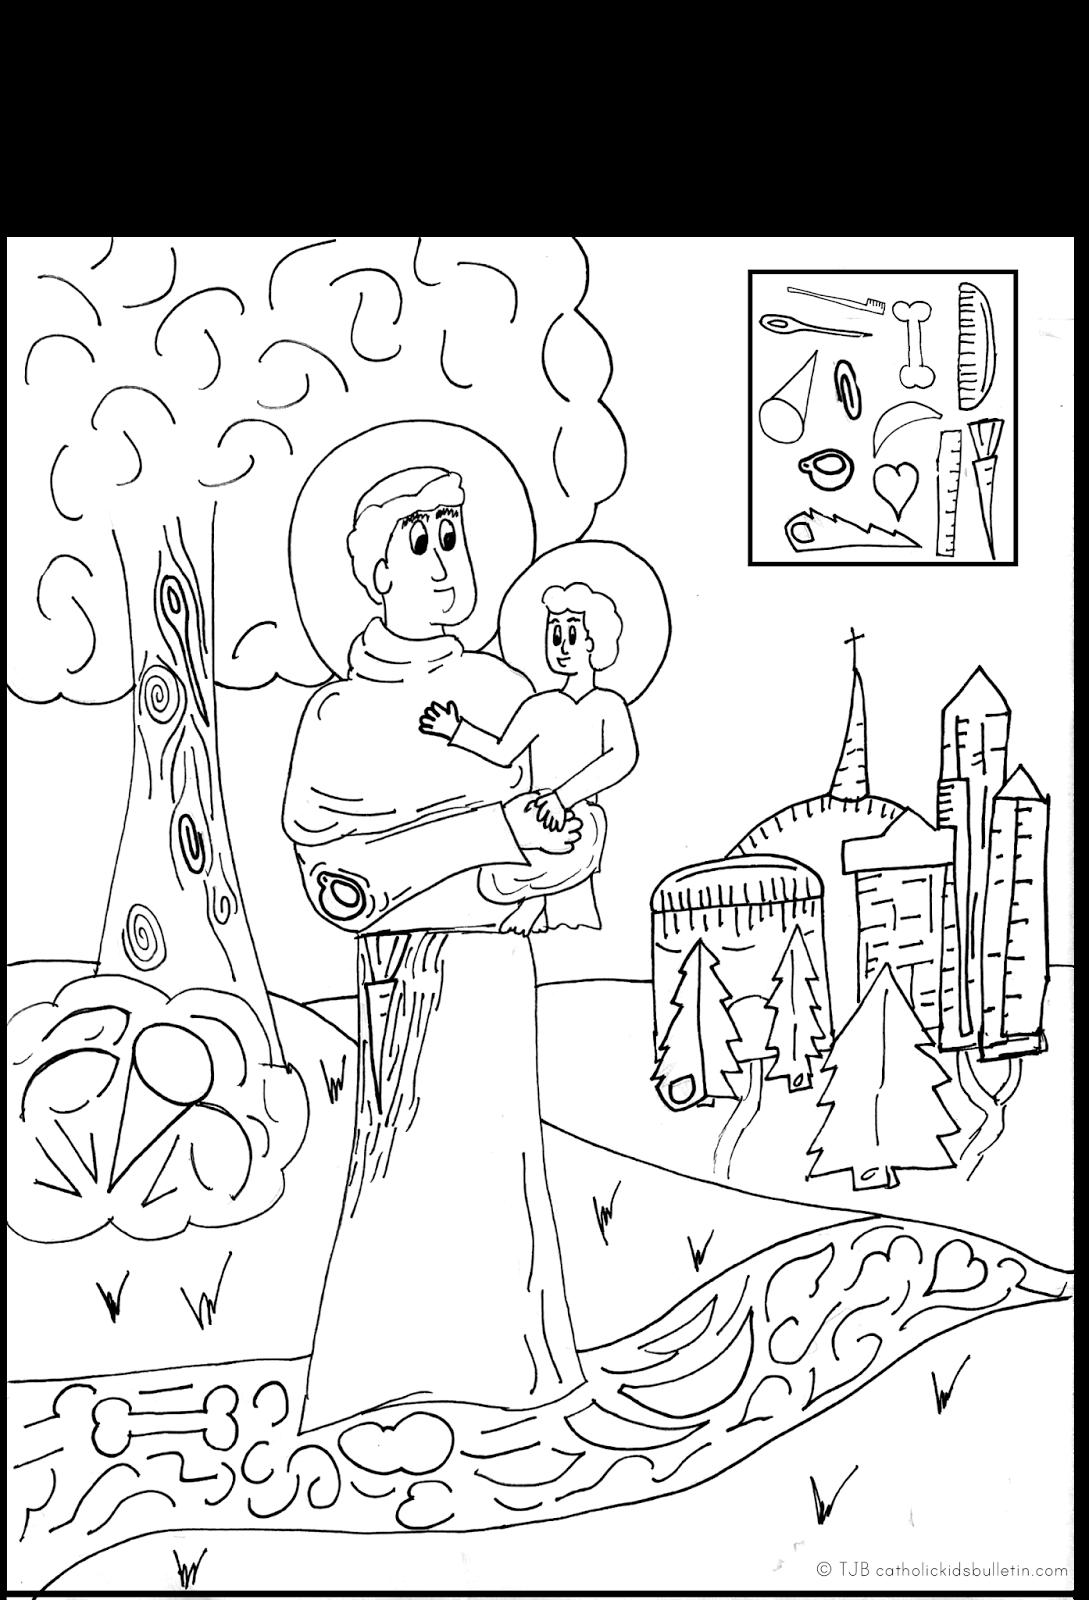 June Catholic Kids Bulletin